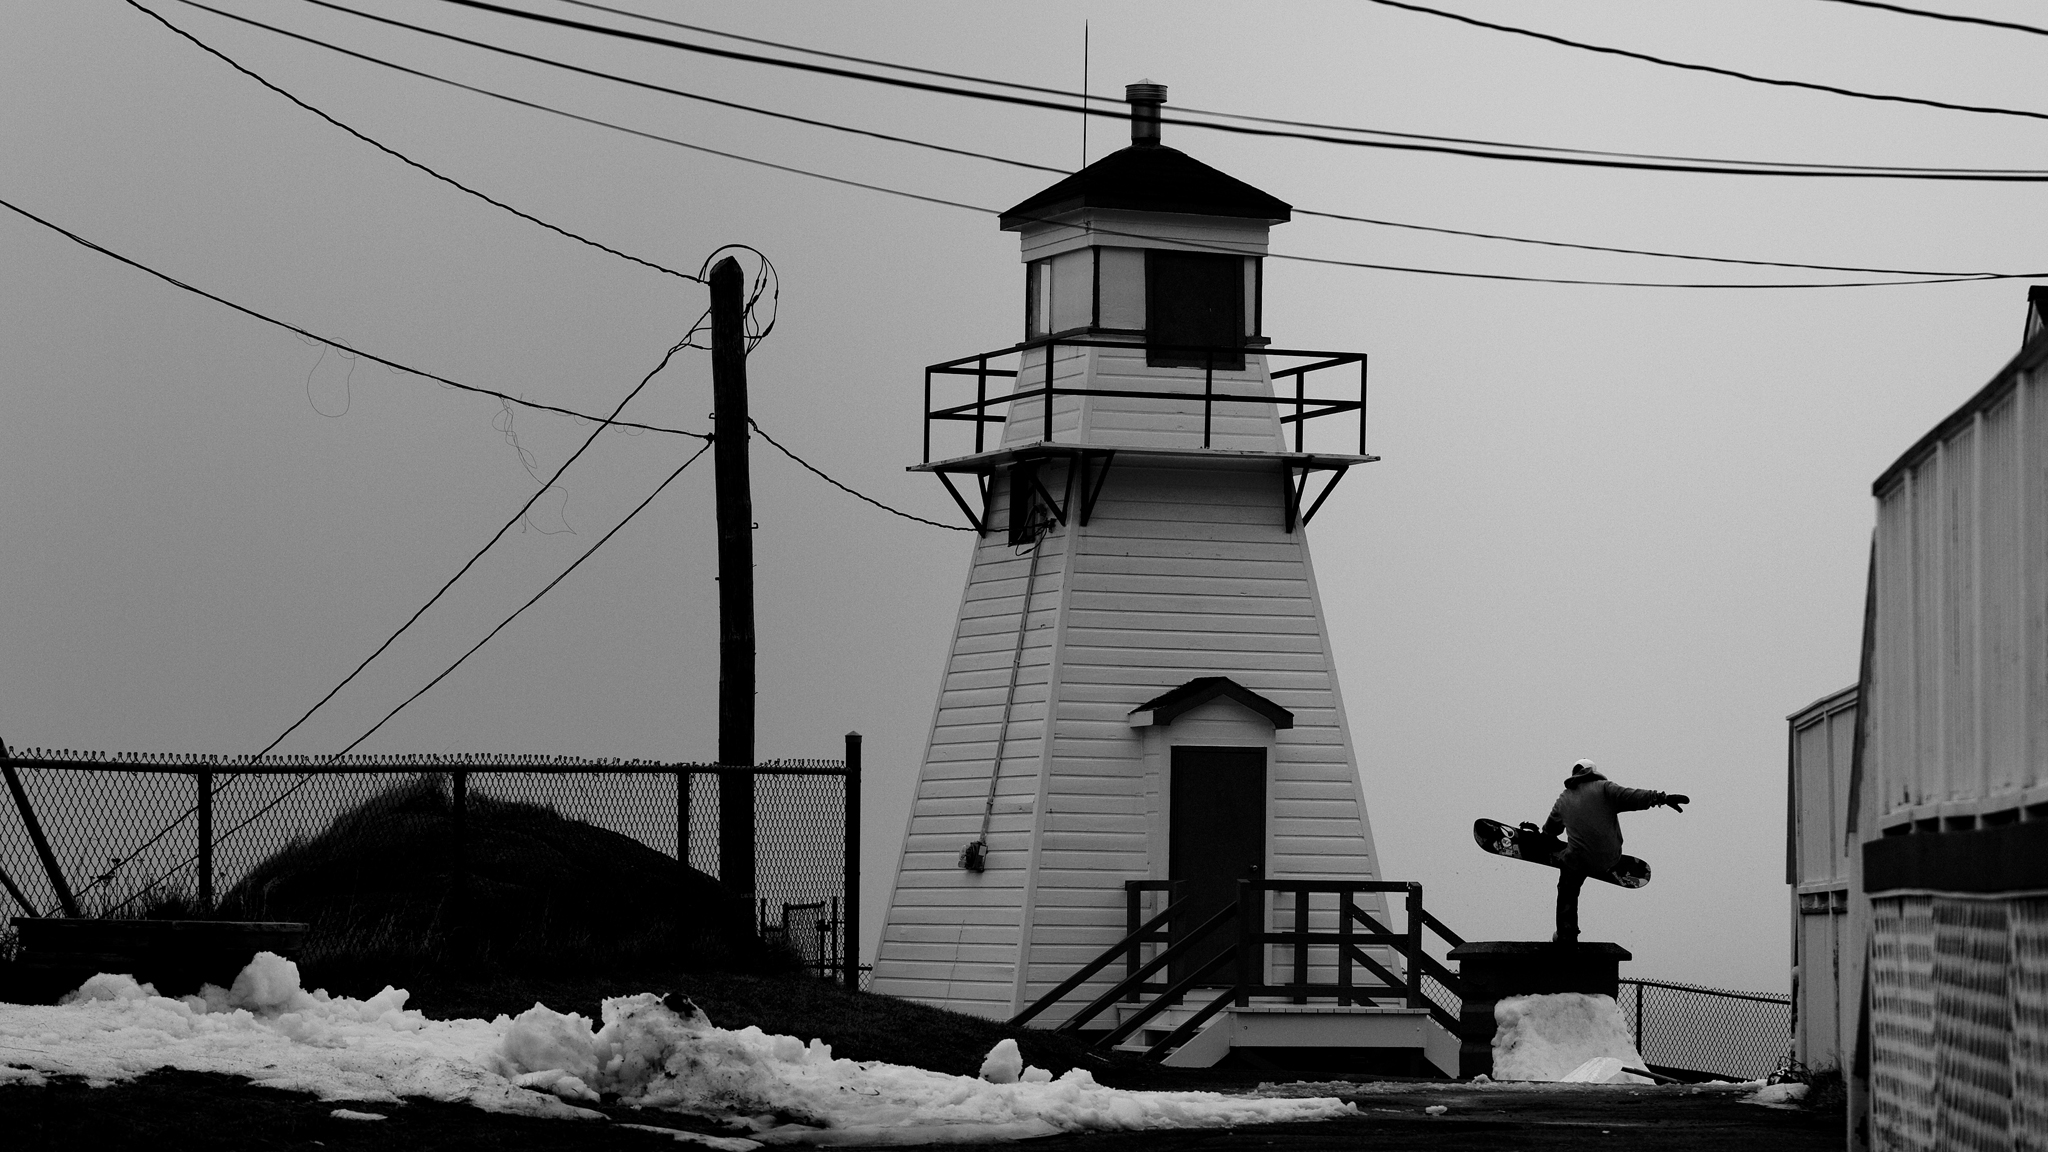 Wojtek Pawlusiak, Newfoundland, Canada